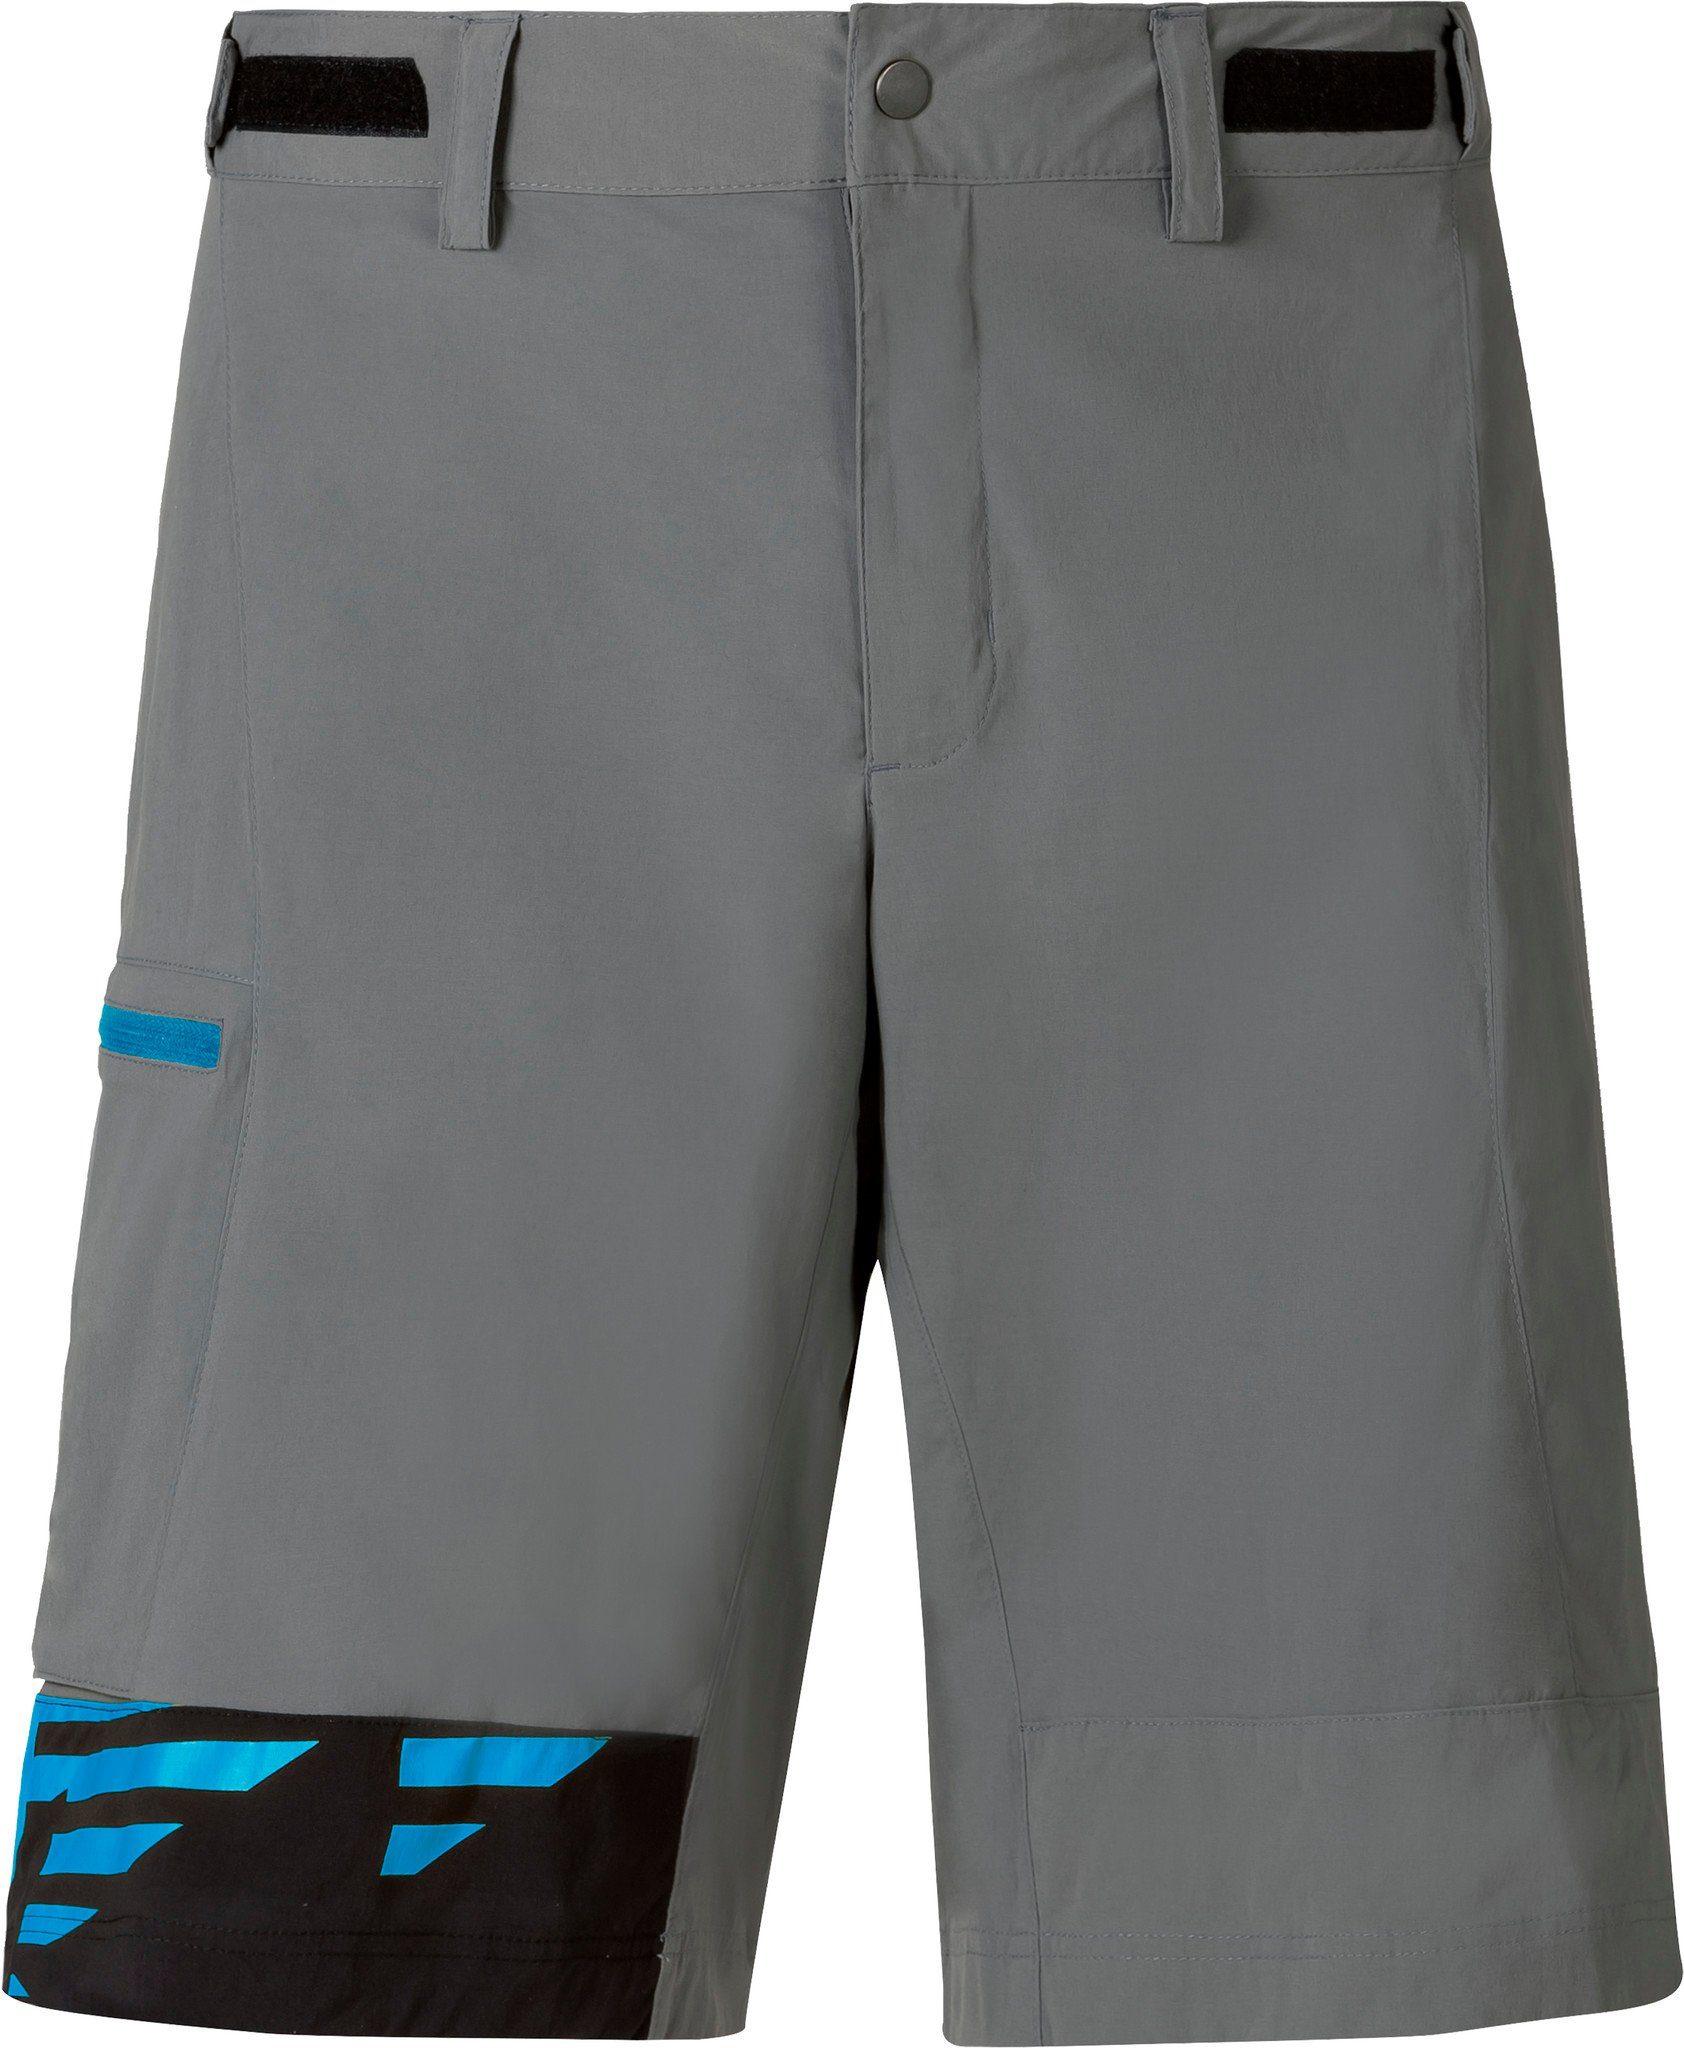 Odlo Radhose »Morzine Shorts Men steel grey-allover print SS17«